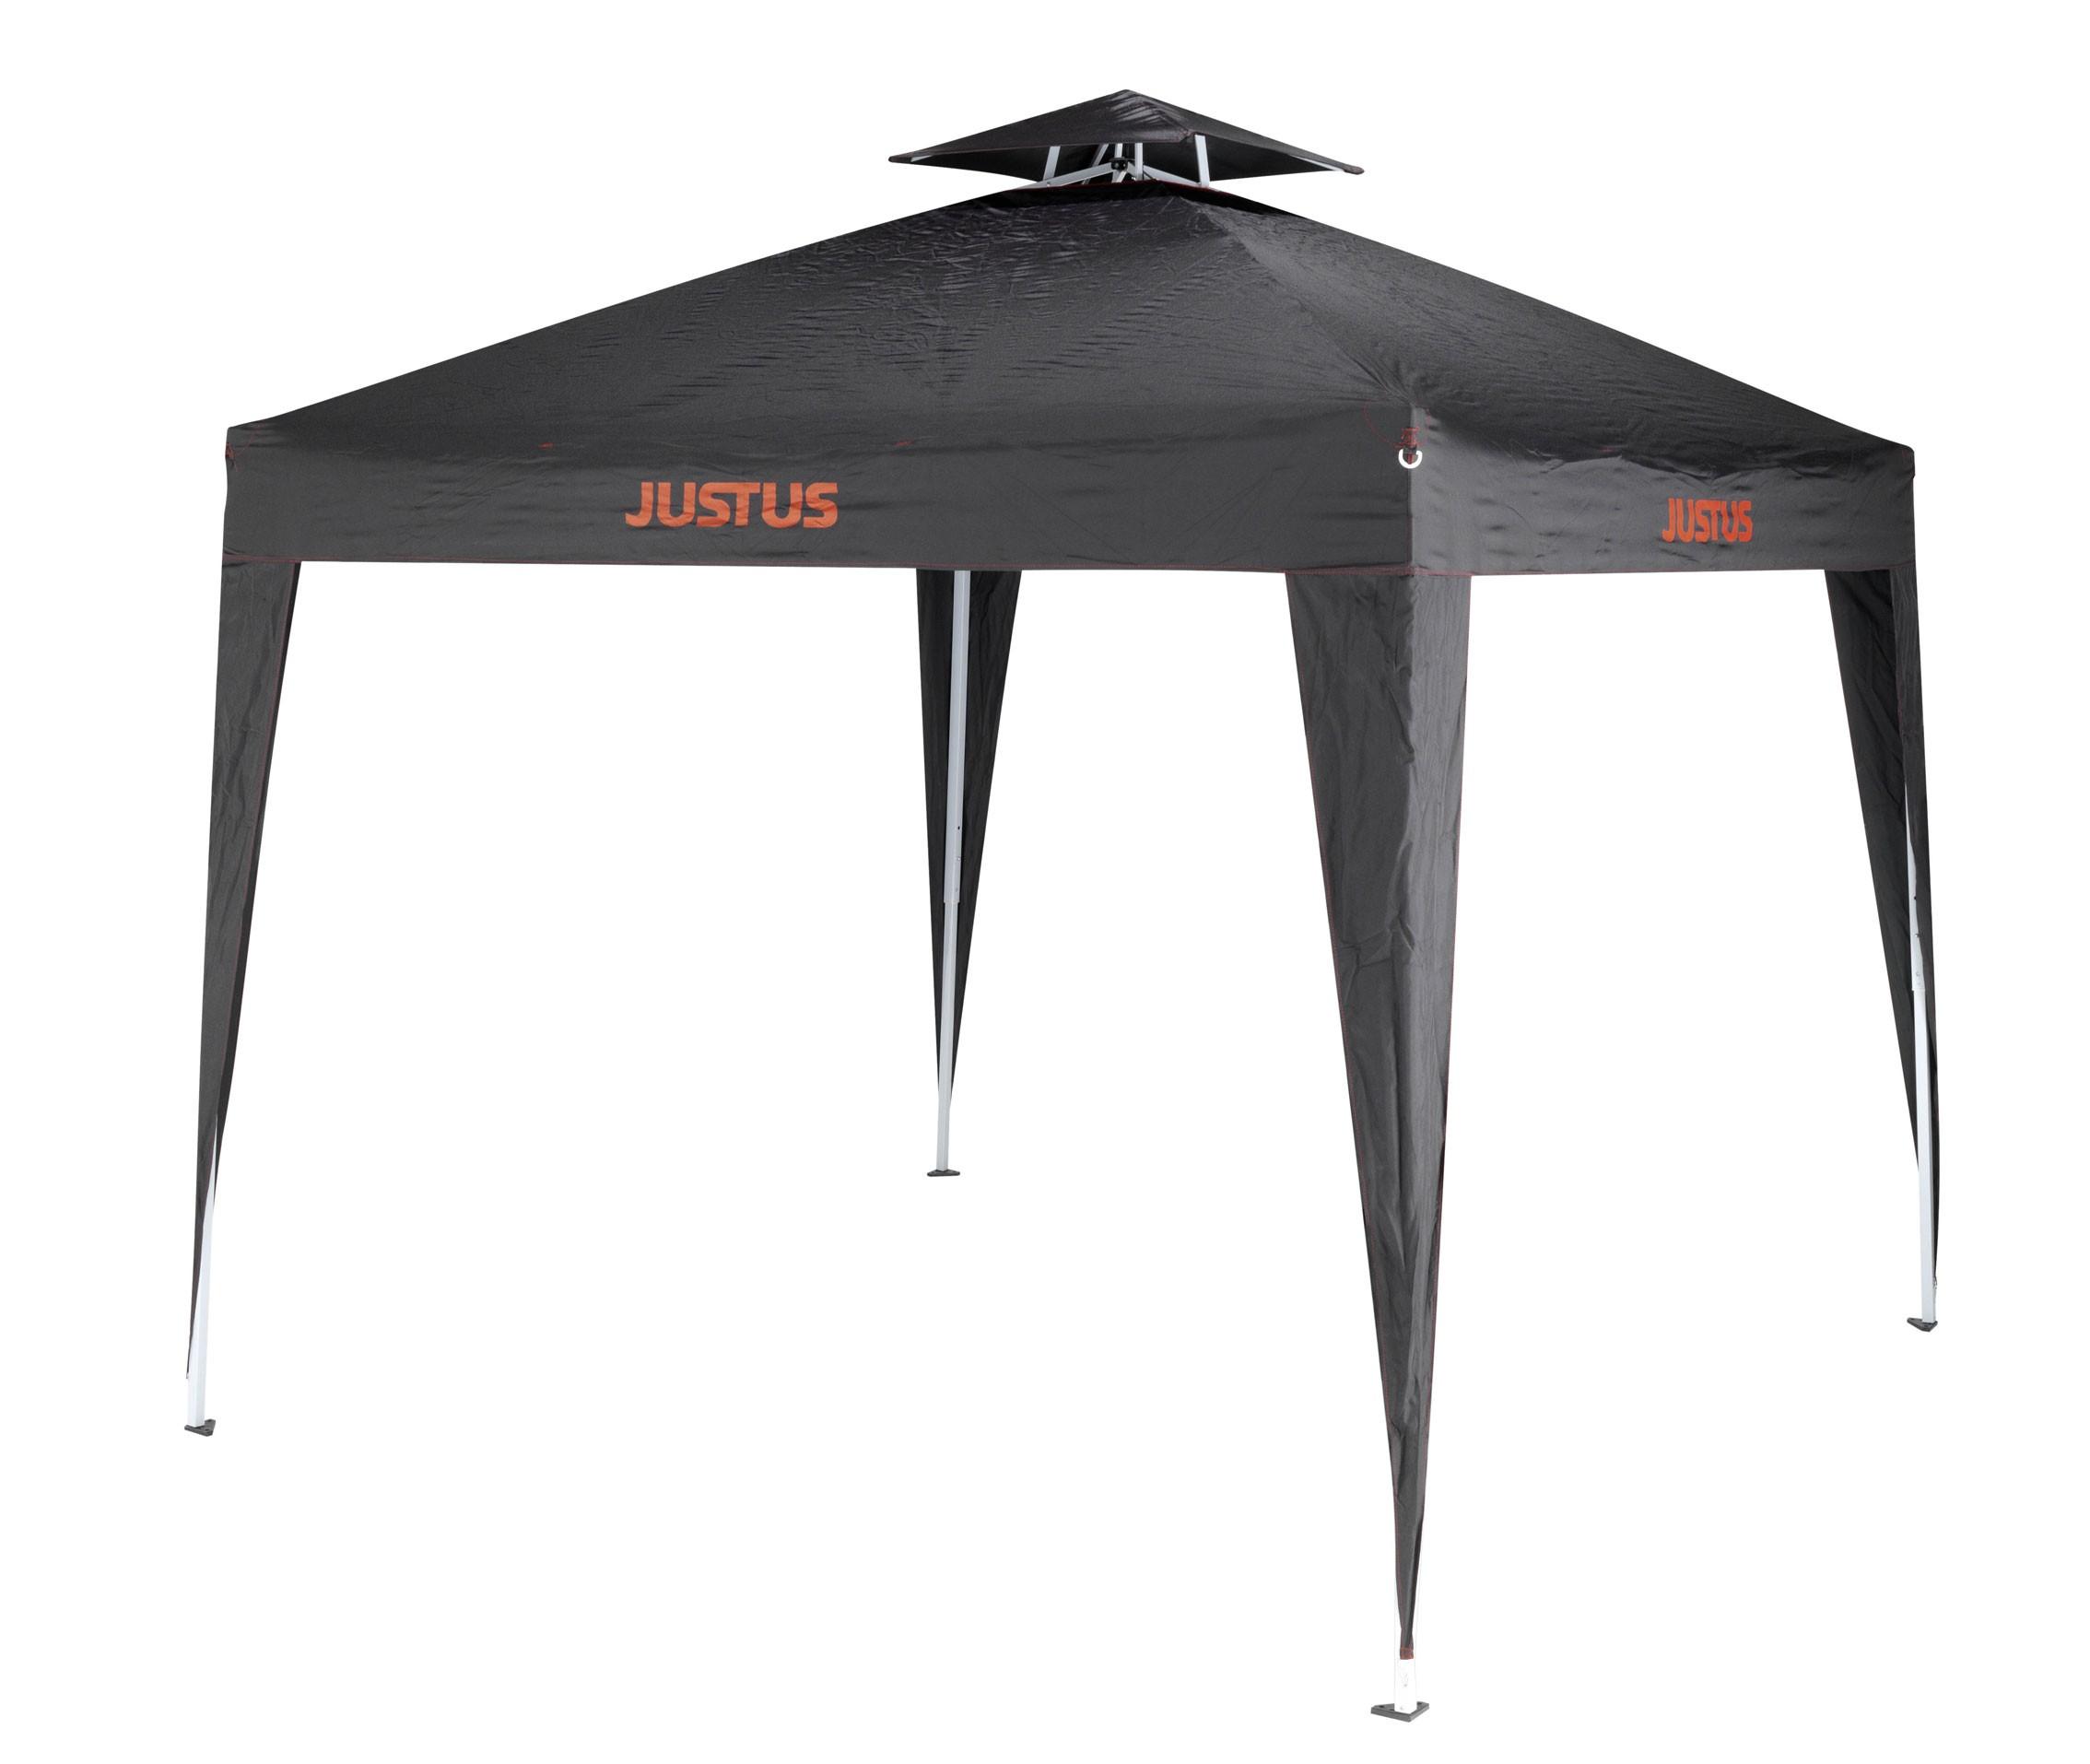 justus pavillon grillpavillon faltbar 2 5x2 5m bei. Black Bedroom Furniture Sets. Home Design Ideas